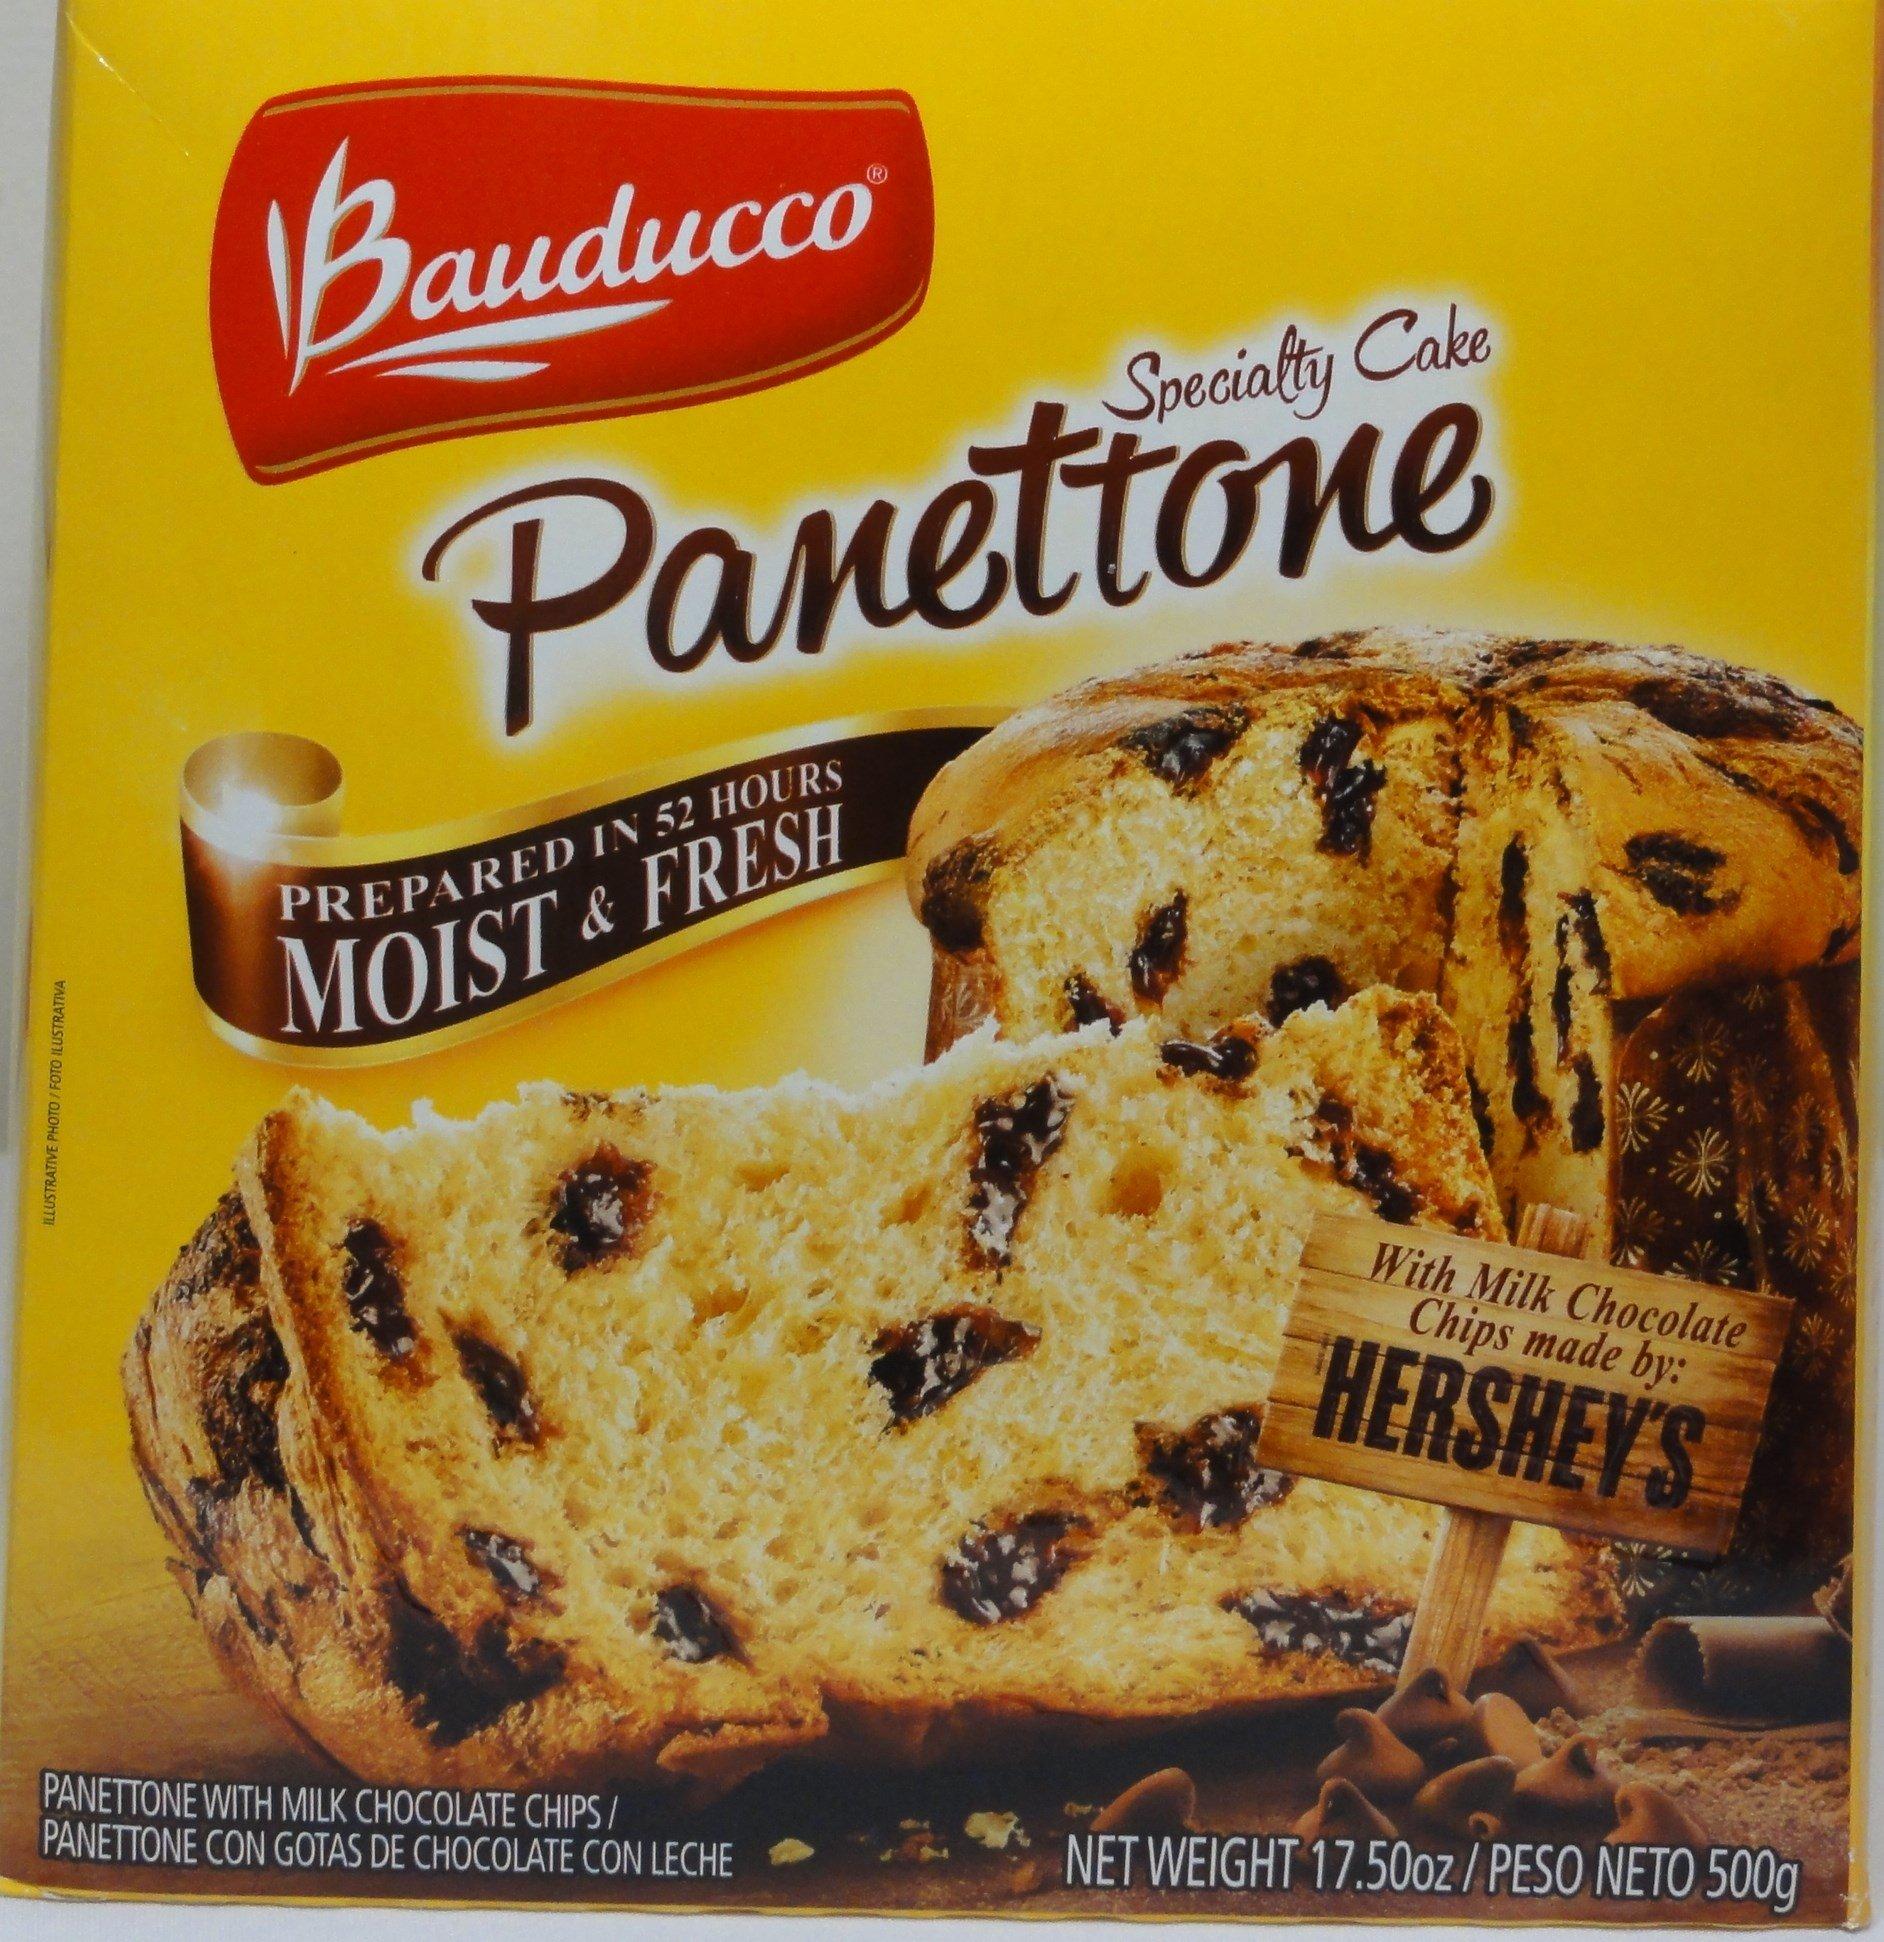 Bauducco Panettone Hershey 17.5 oz.(UNIT)